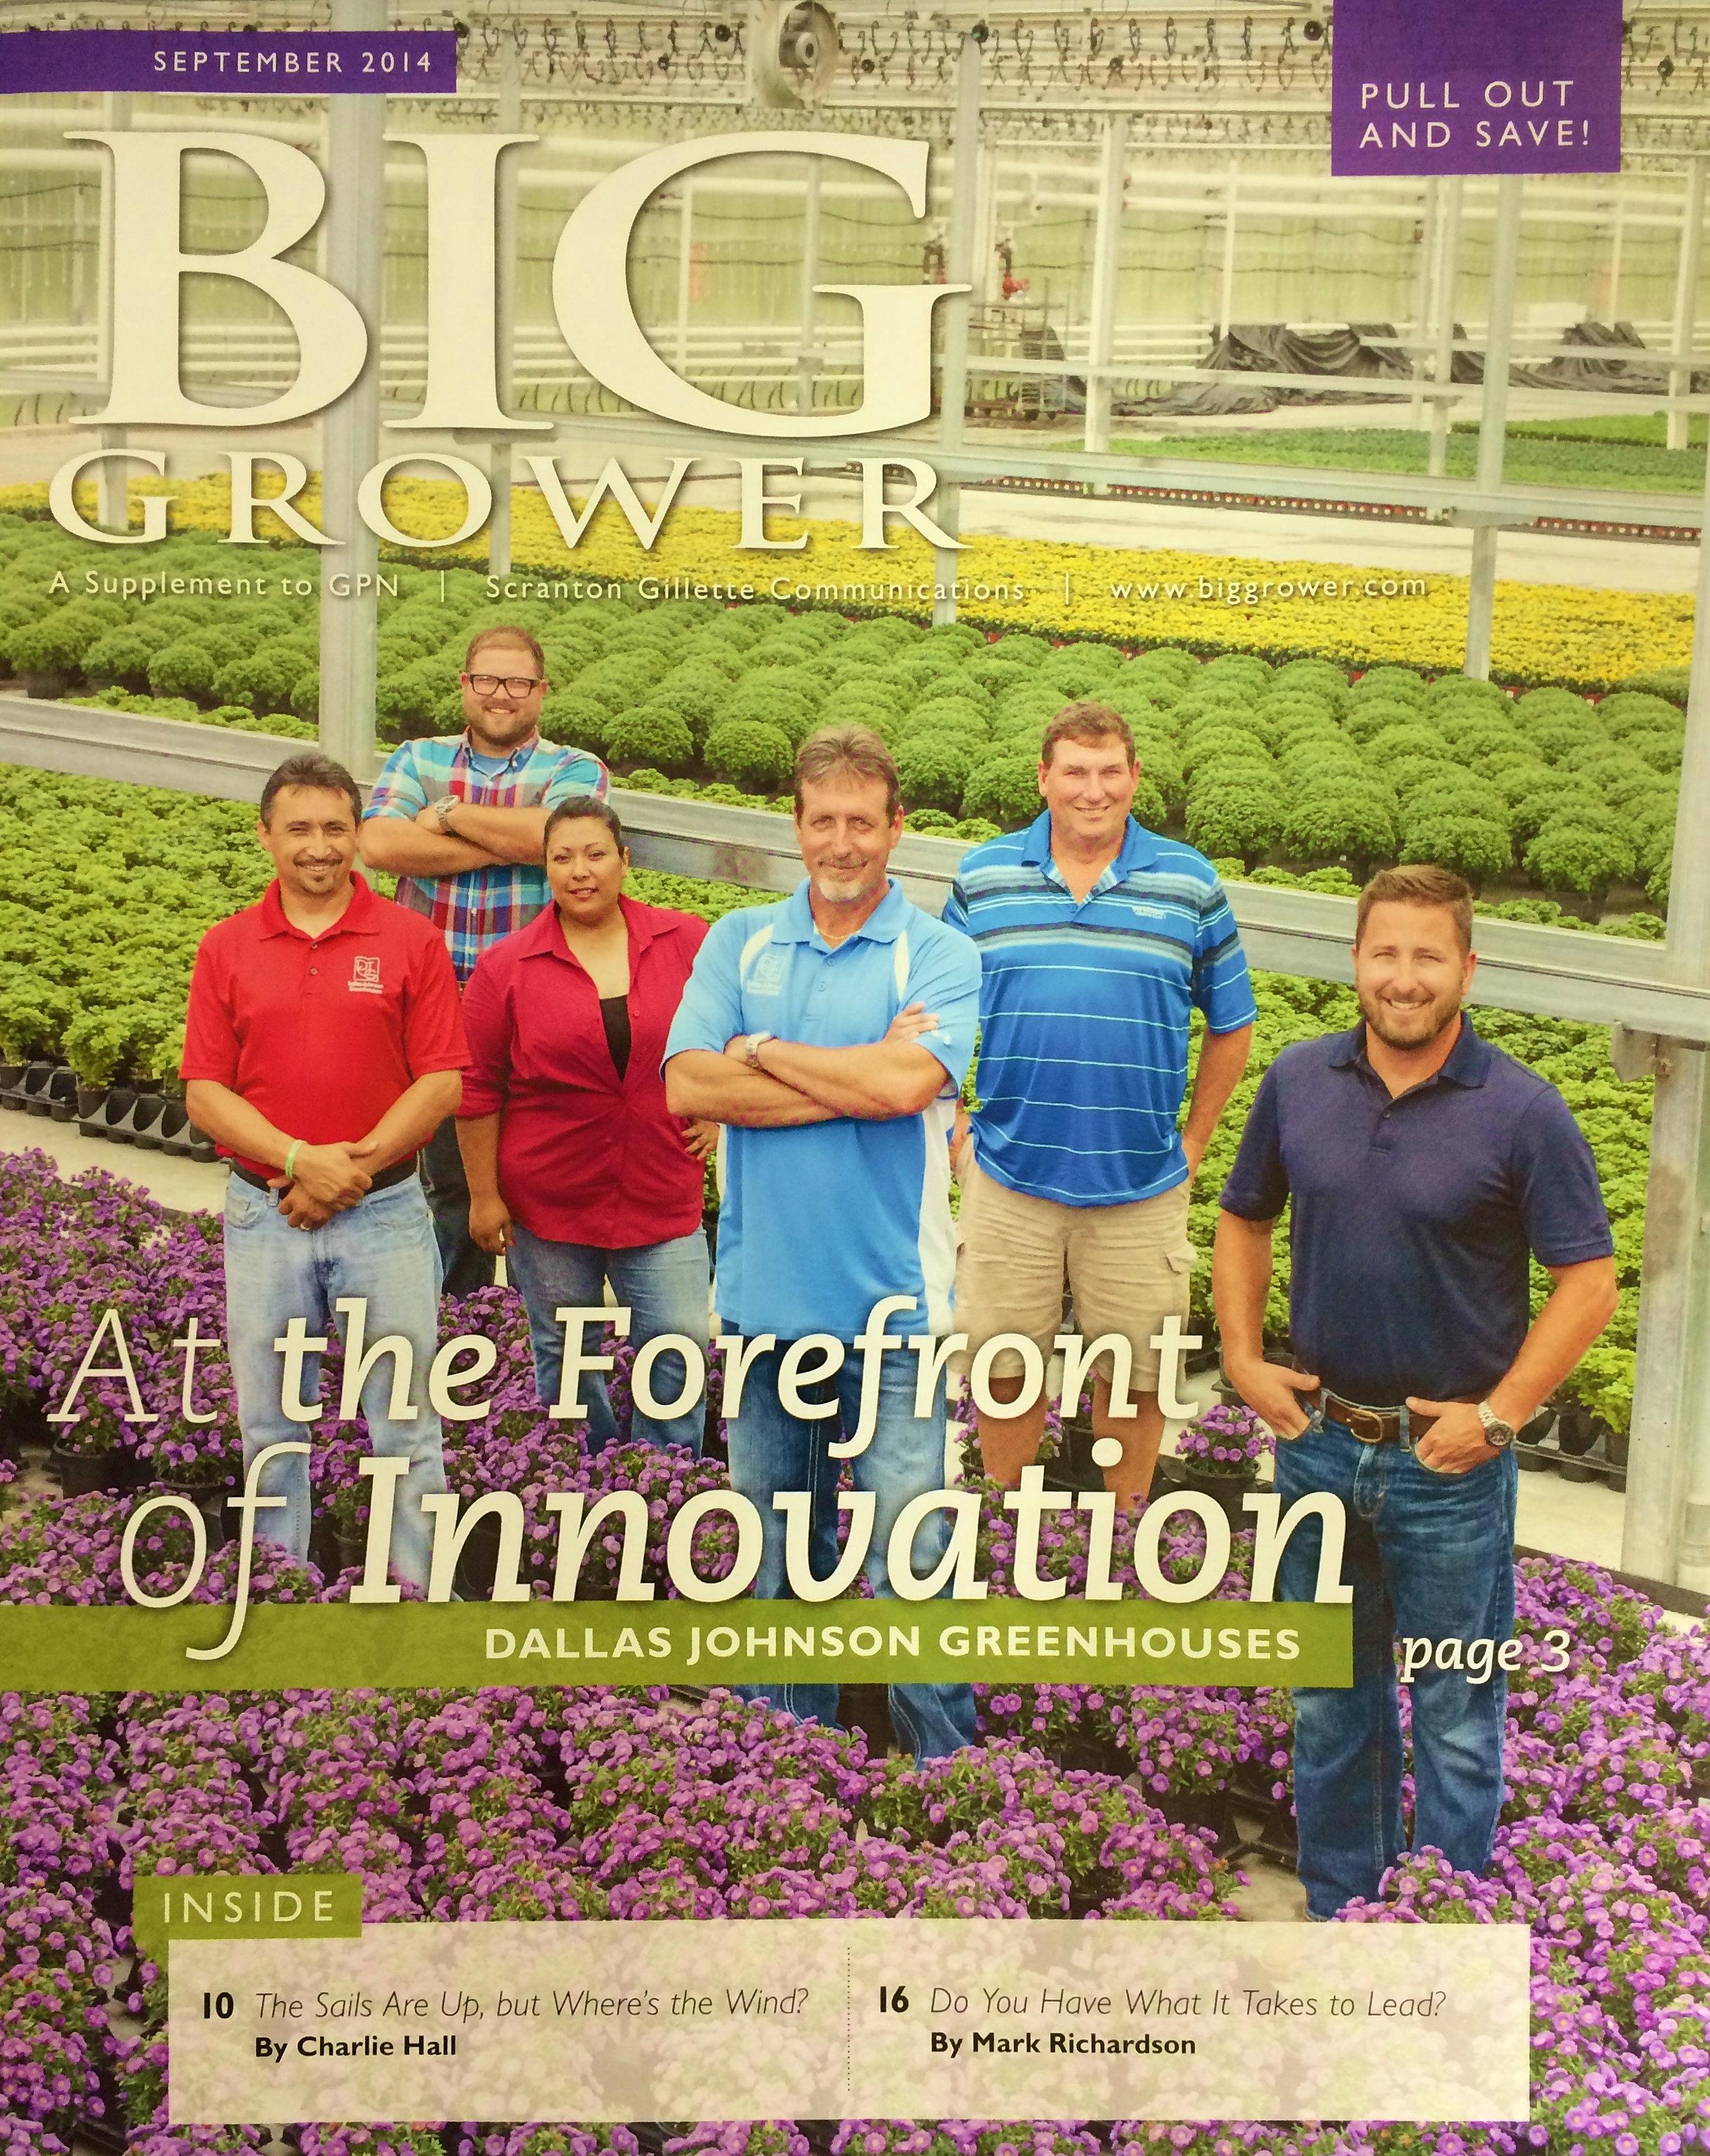 The greenhouse richardson - Dallas Johnson Greenhouses